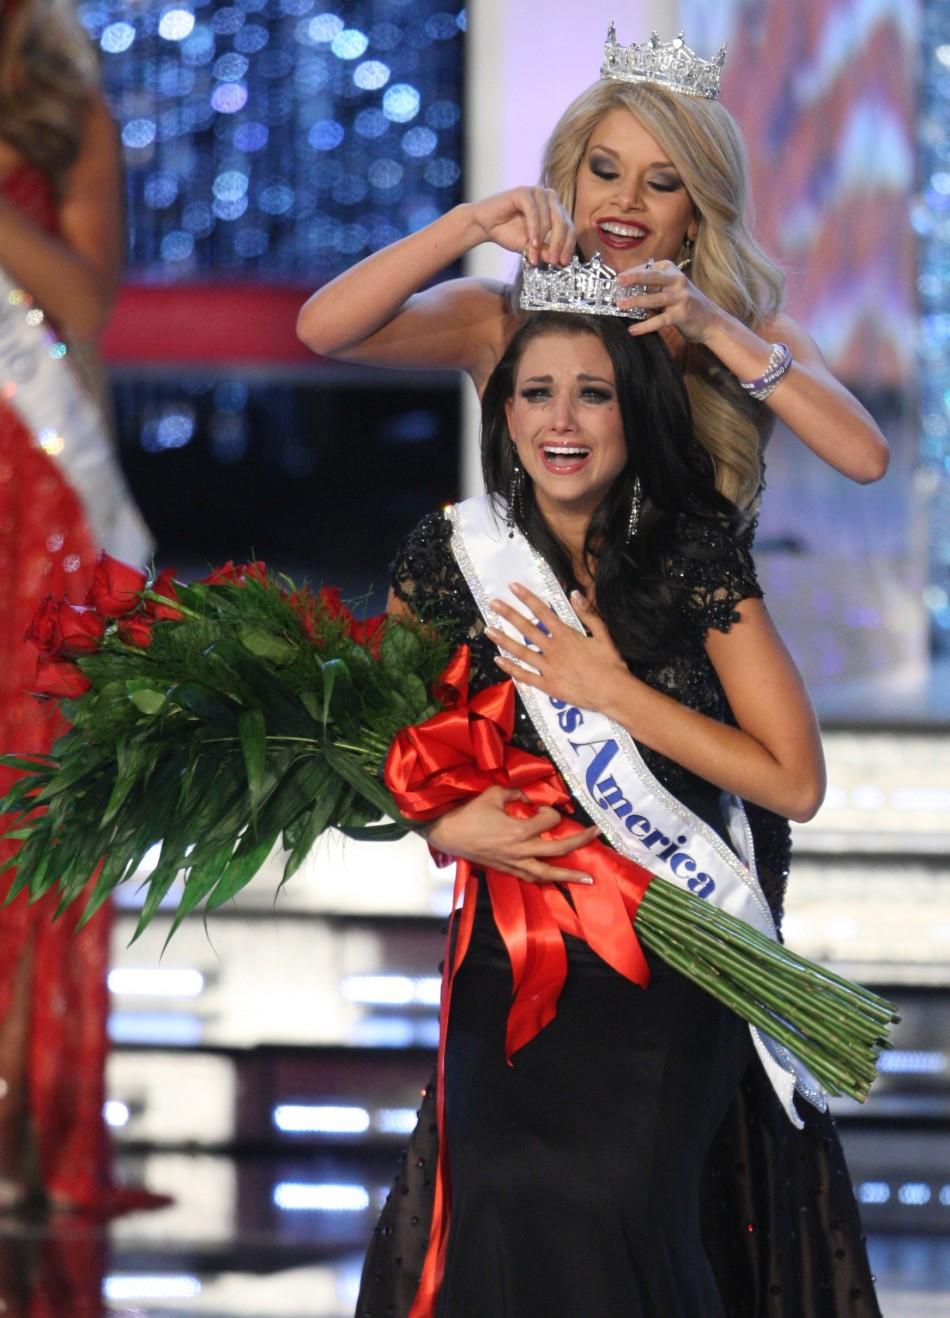 Laura_Kaeppeler_Miss_America_2012_photos